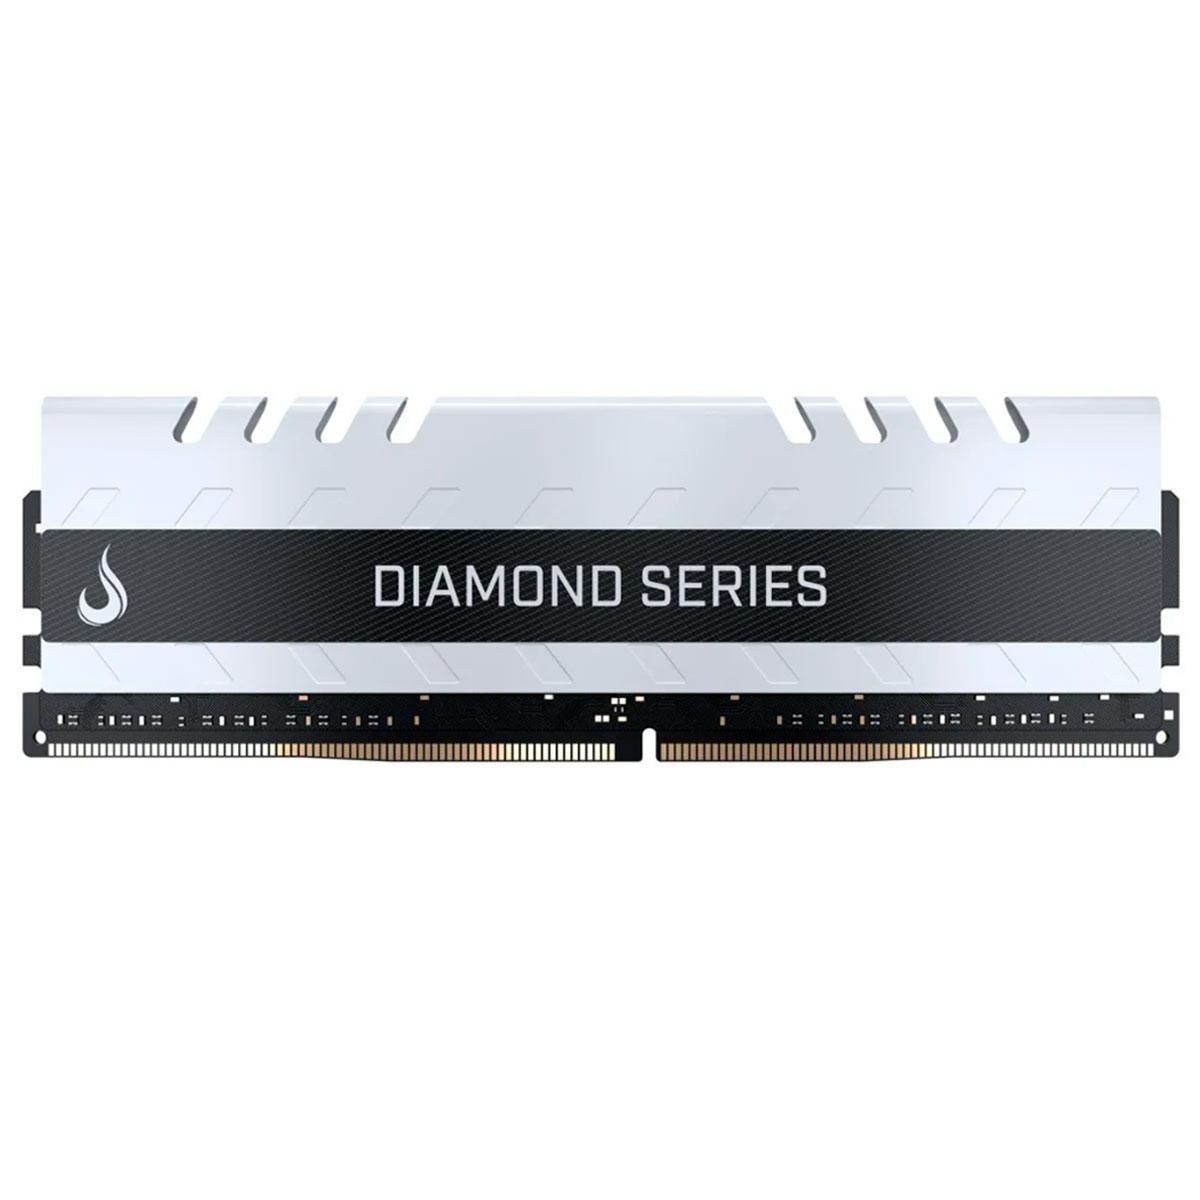 Memória Gamer Rise Mode Diamond 8GB, DDR4, 2400MHz, CL15, Branca - RM-D4-8G-2400D WHITE